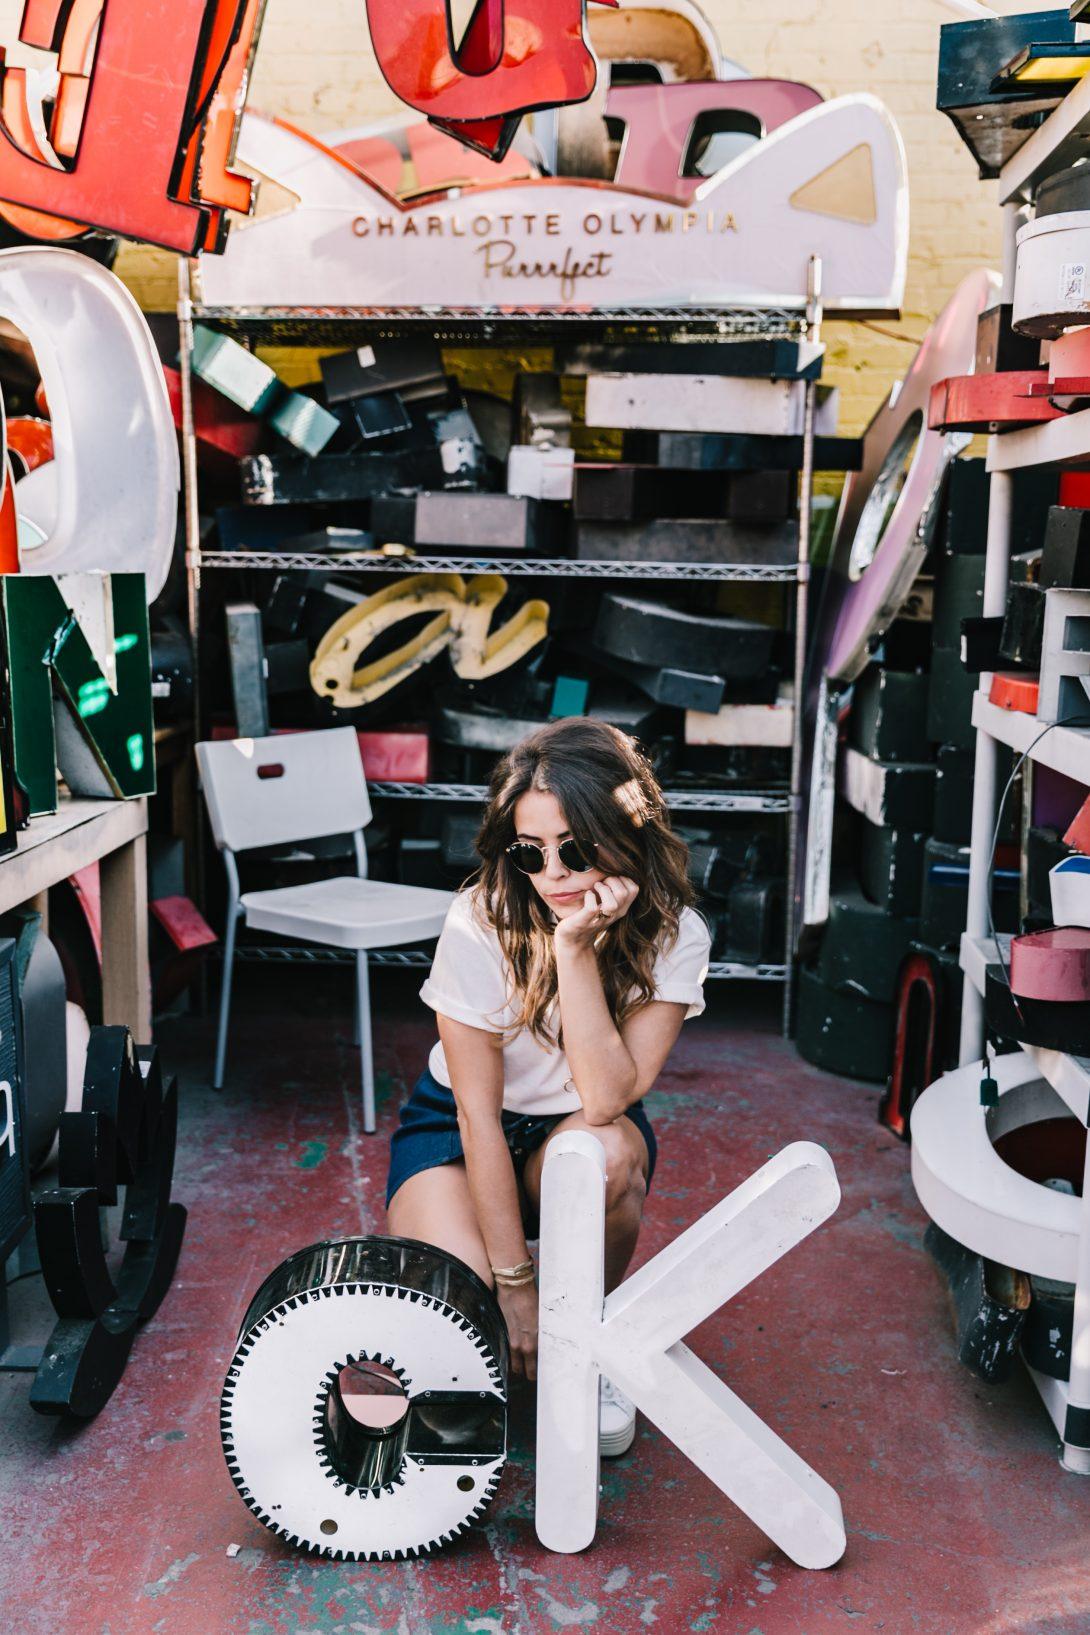 Calvin_Klein-Denim_Skirt-CK_Collection-Los_Angeles-Nick_Metropolis-Saint_Laurent_Sneakers-Pink_Bag-Outfit-Collage_Vintage--33